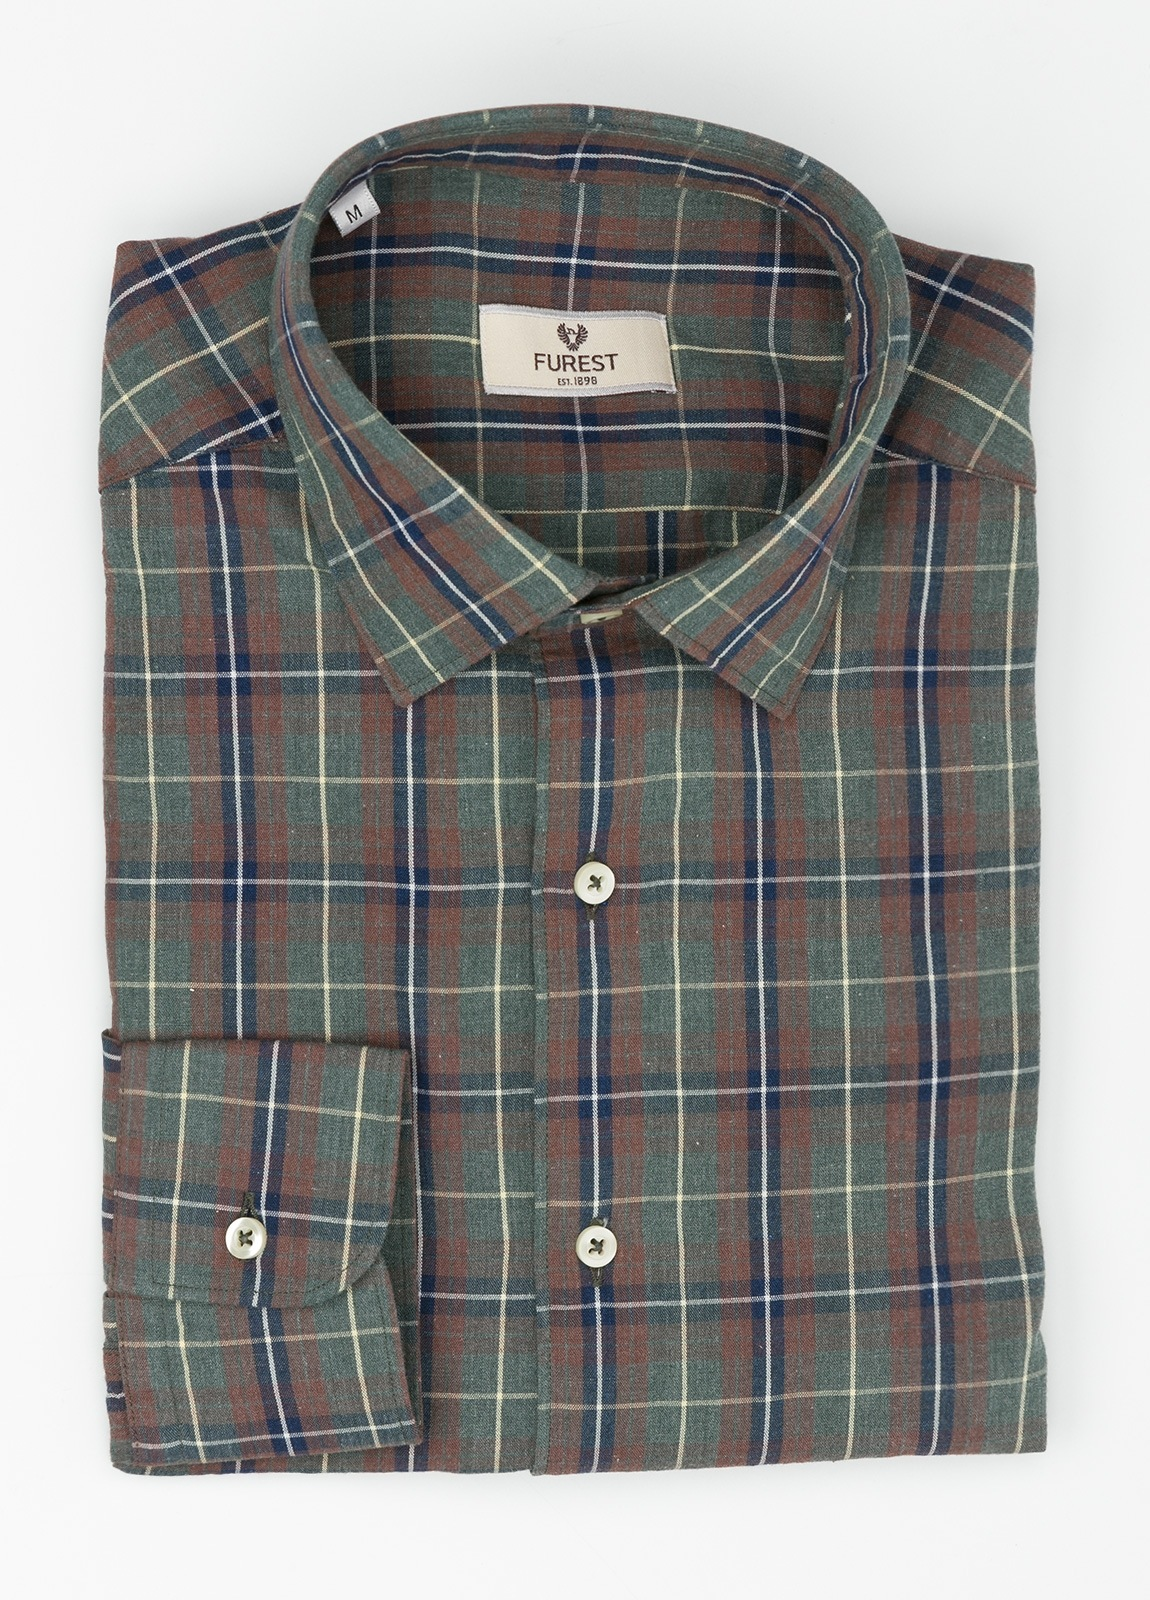 Camisa Leisure Wear REGULAR FIT modelo PORTO, cuadros gris, teja. 100% Algodón. - Ítem3